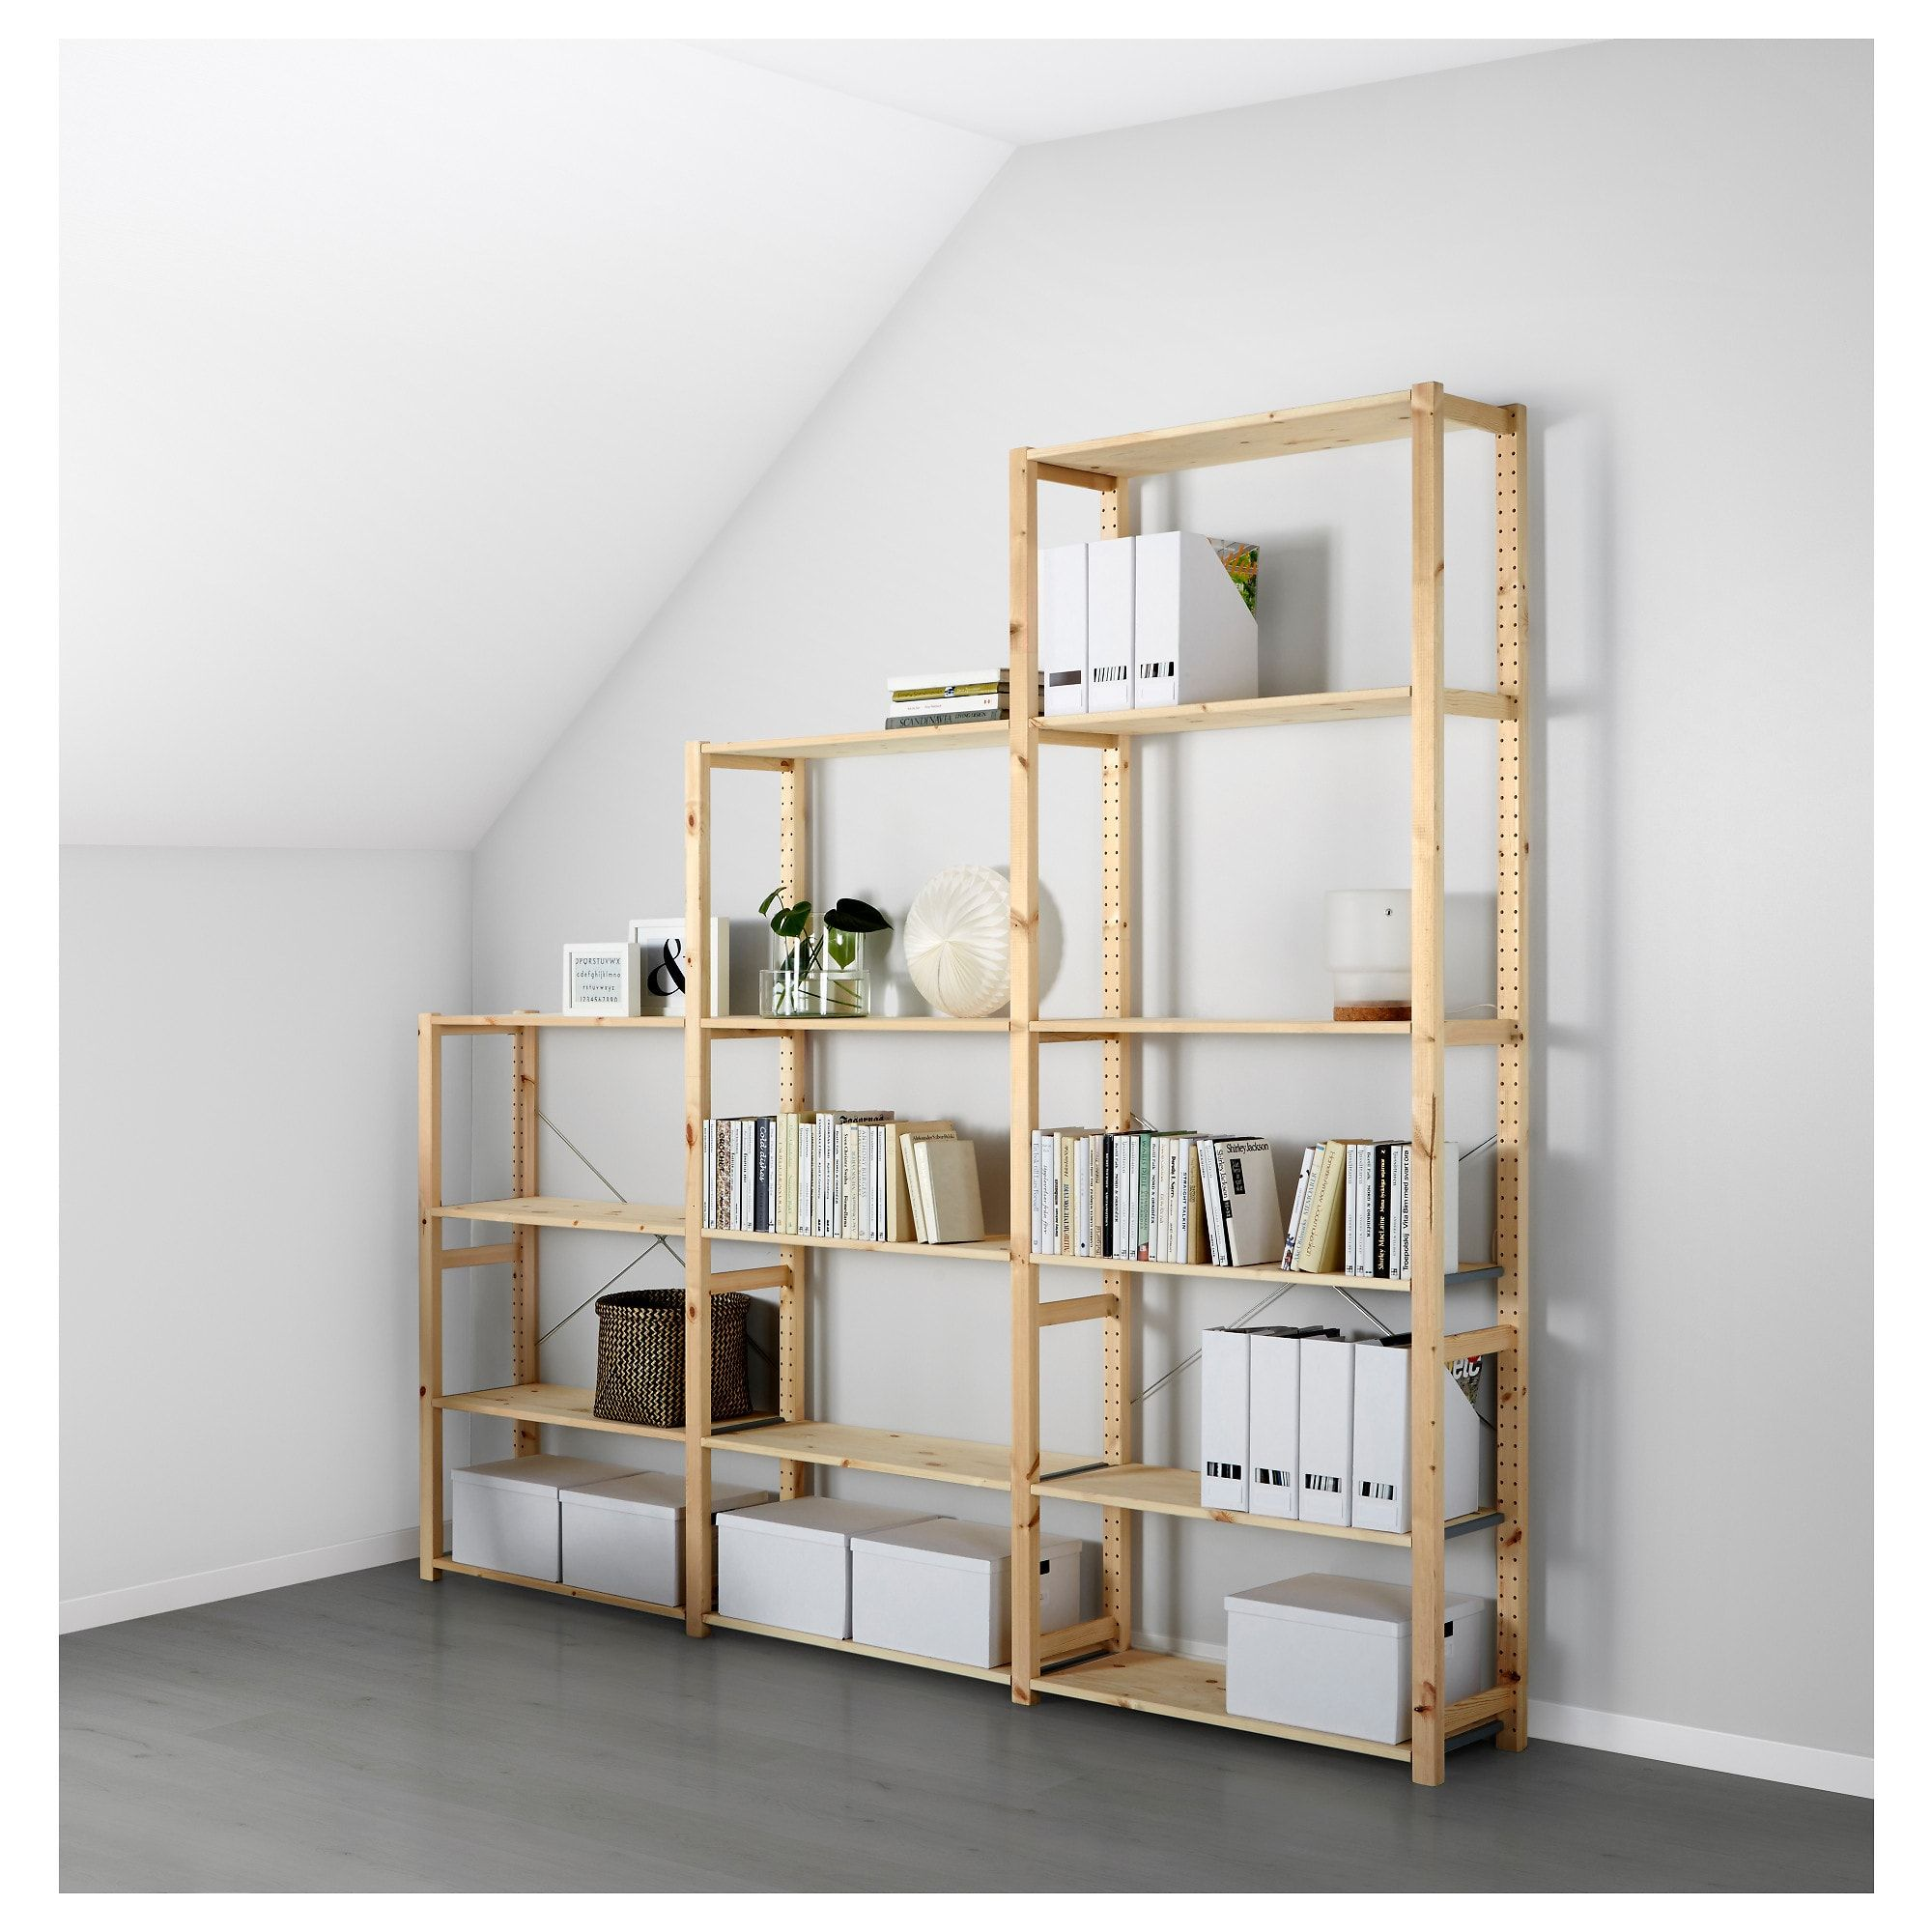 Us Furniture And Home Furnishings In 2020 Shelves Ikea Home